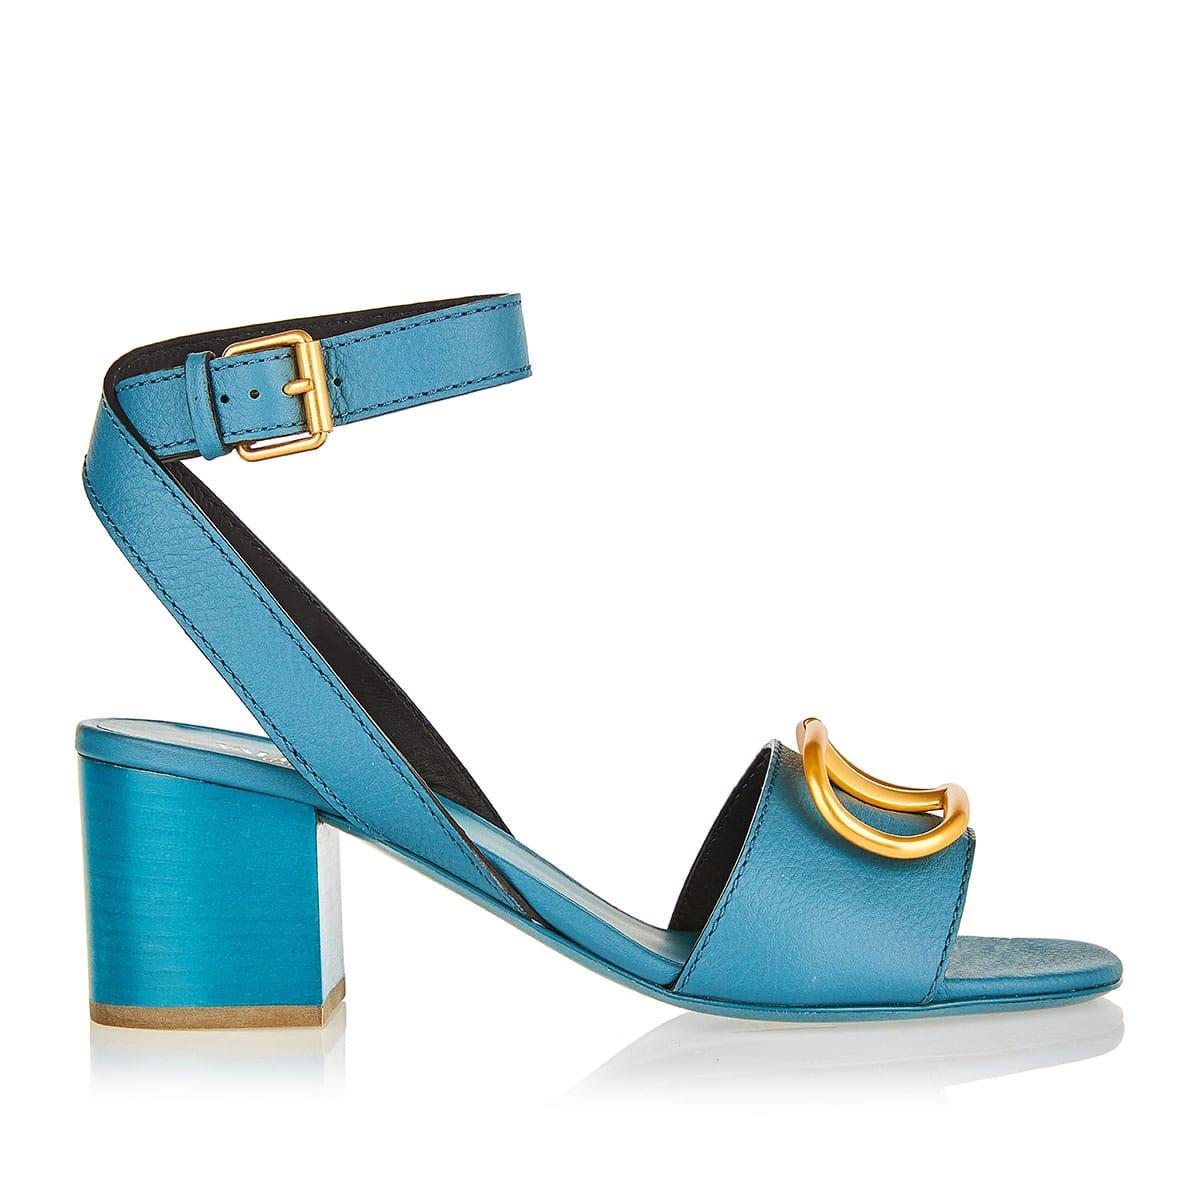 Vlogo leather sandals